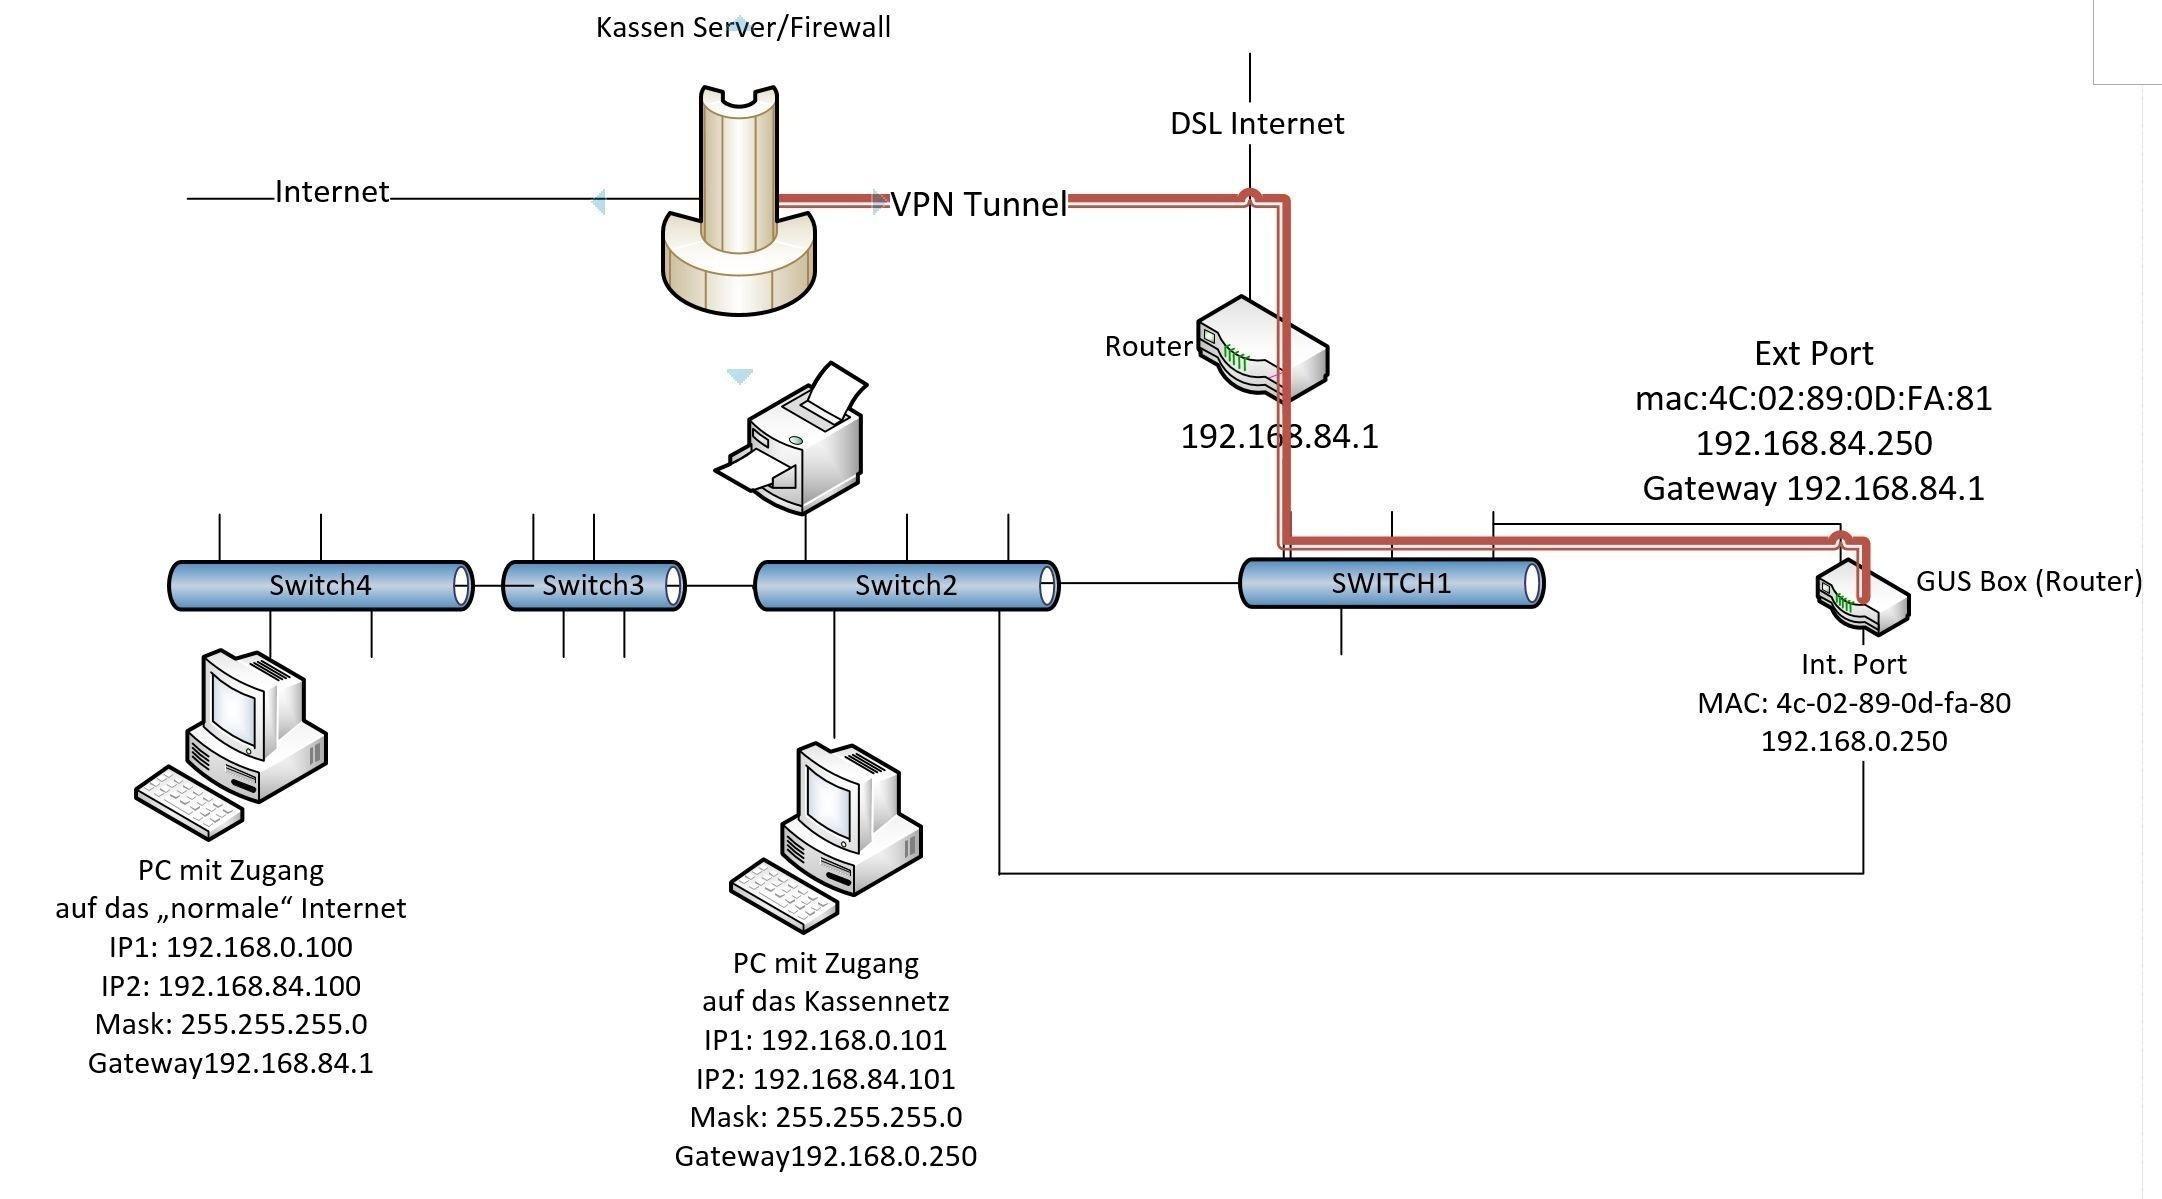 Car Subwoofer Diagram Wiring Diagram Ne595r0 – Wire Diagram Of Car Subwoofer Diagram